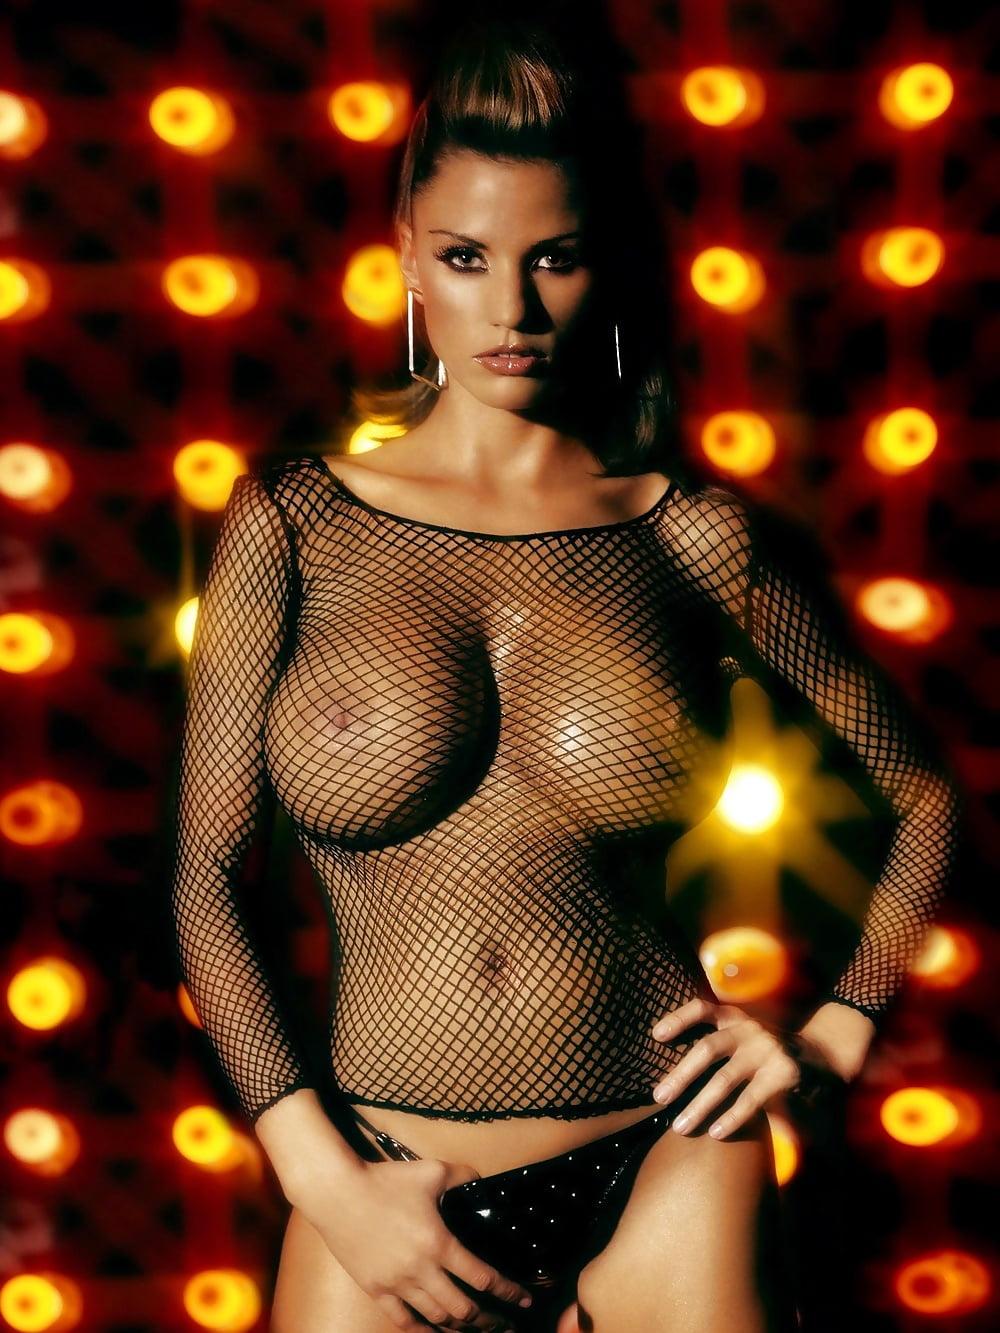 Katie price jordan nude sex photo